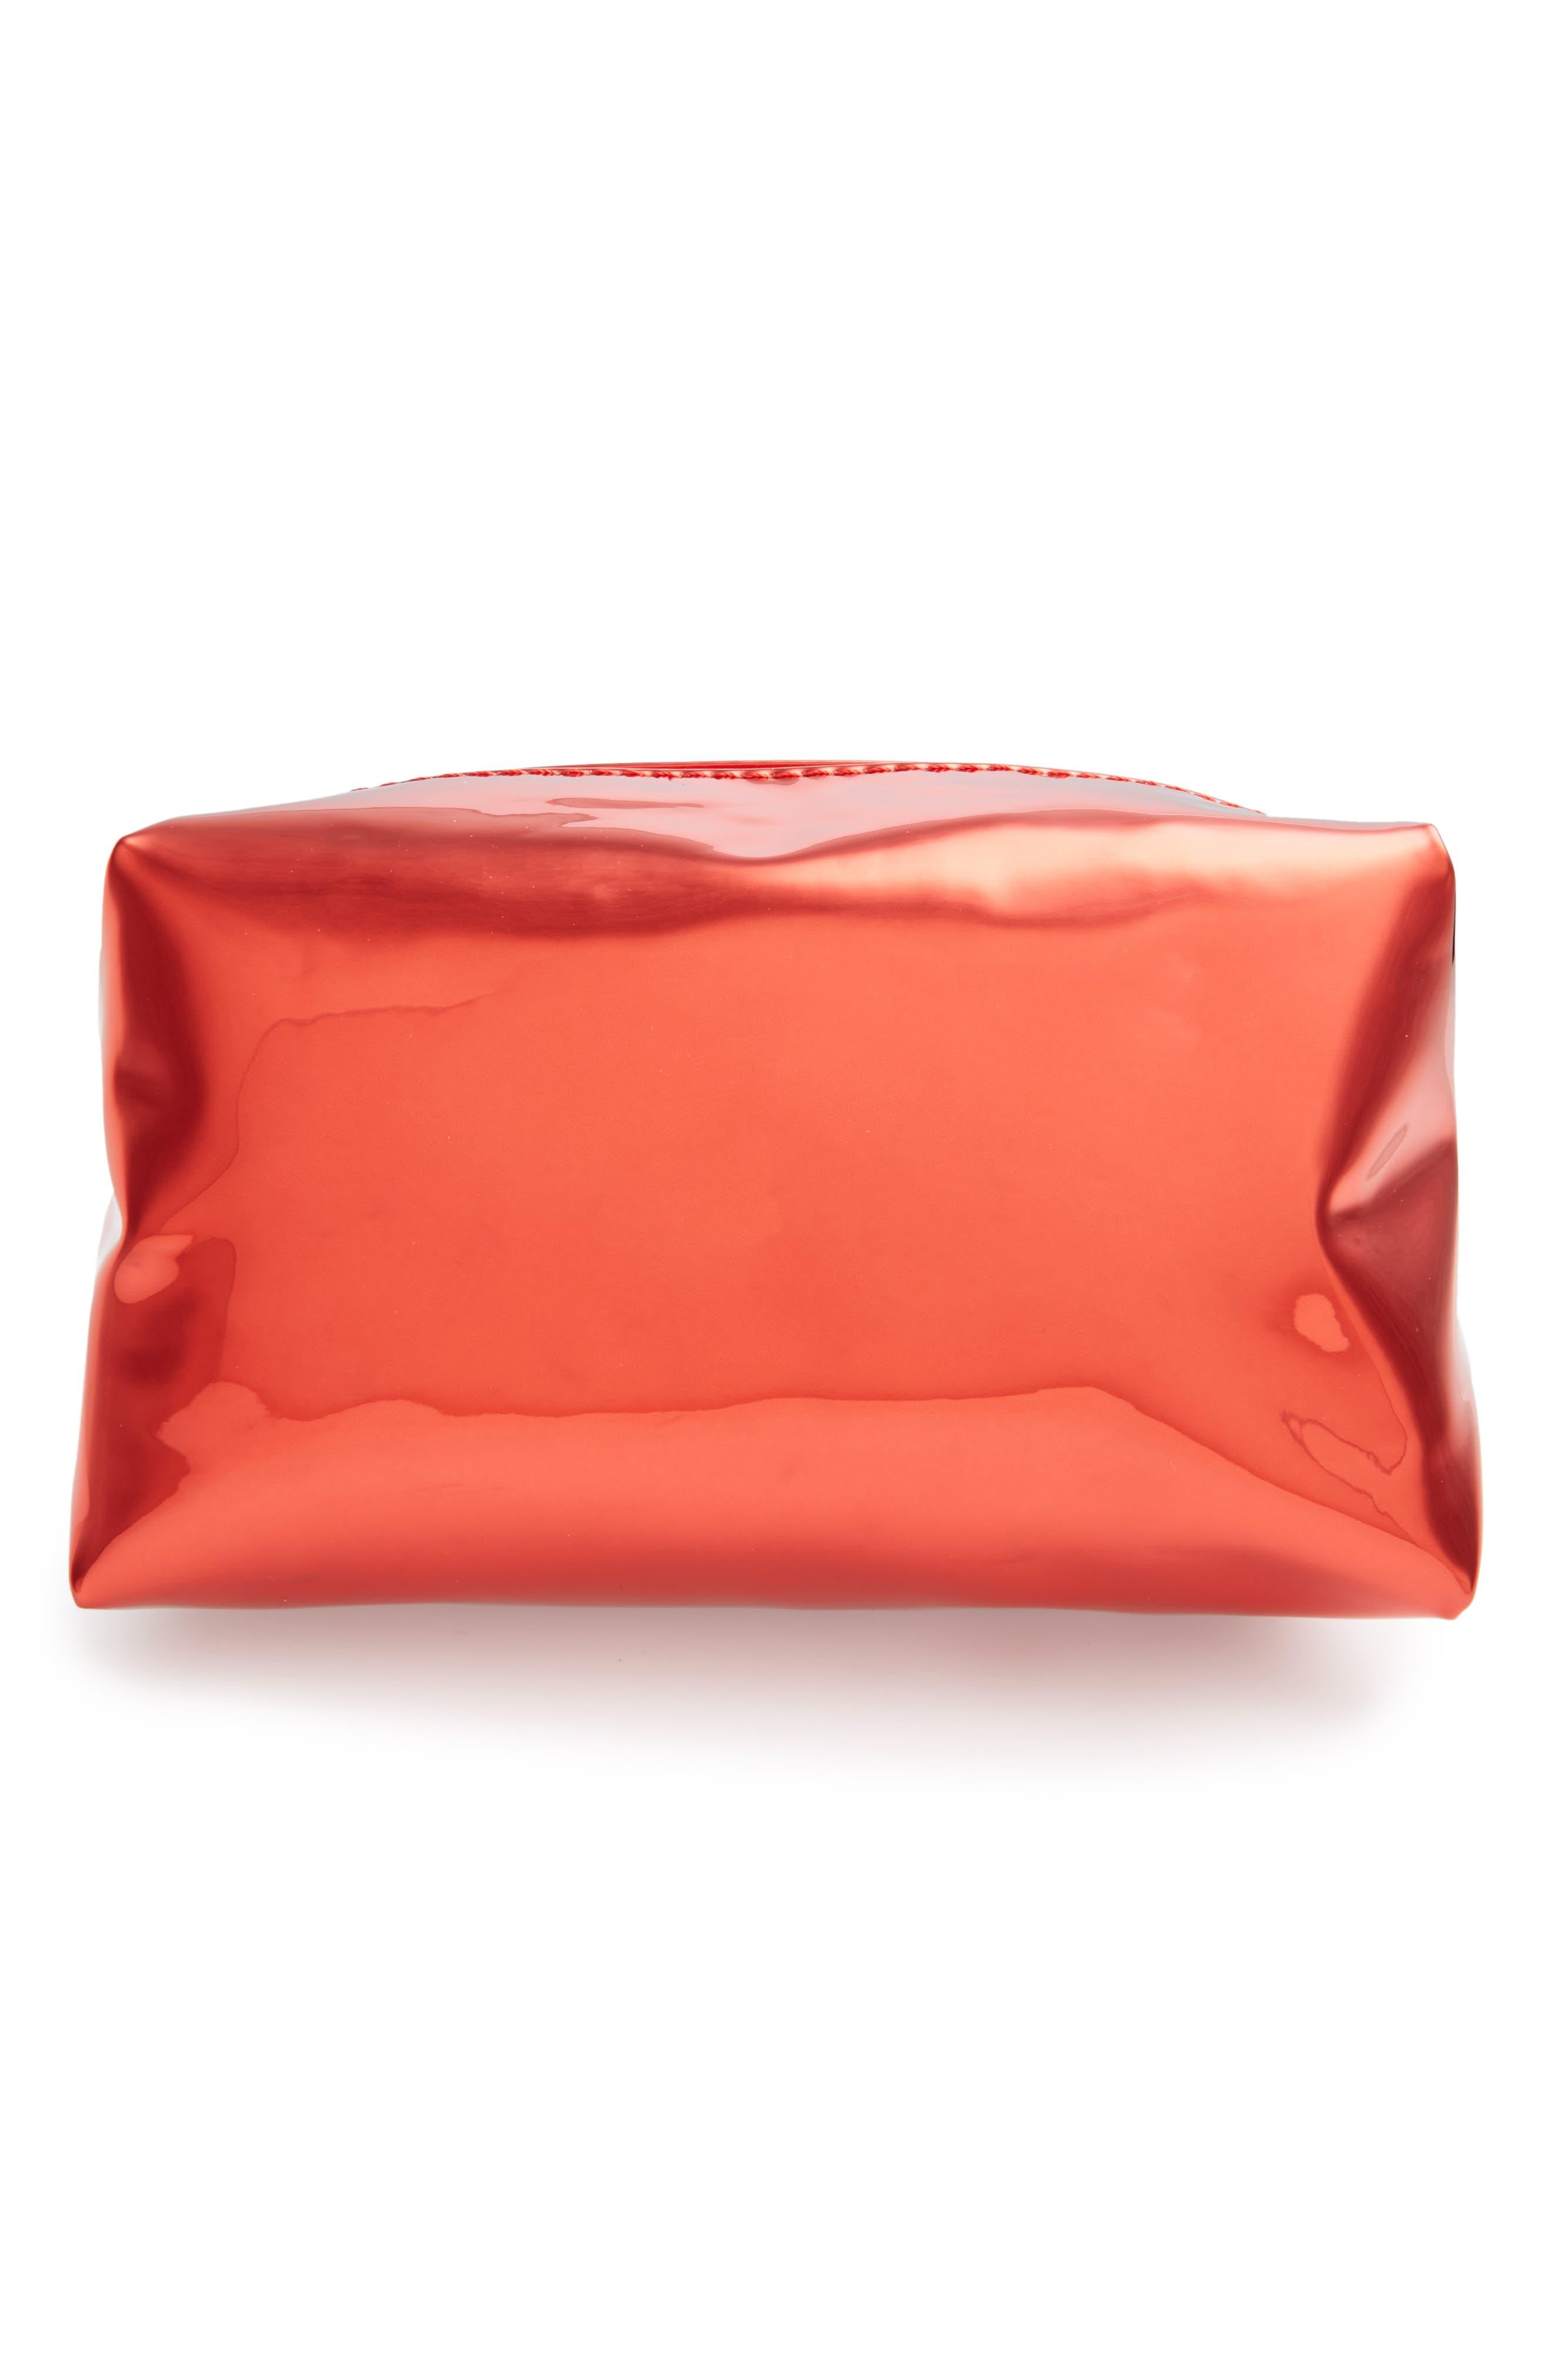 Main Image - Yoki Bags Metallic Cosmetics Bag